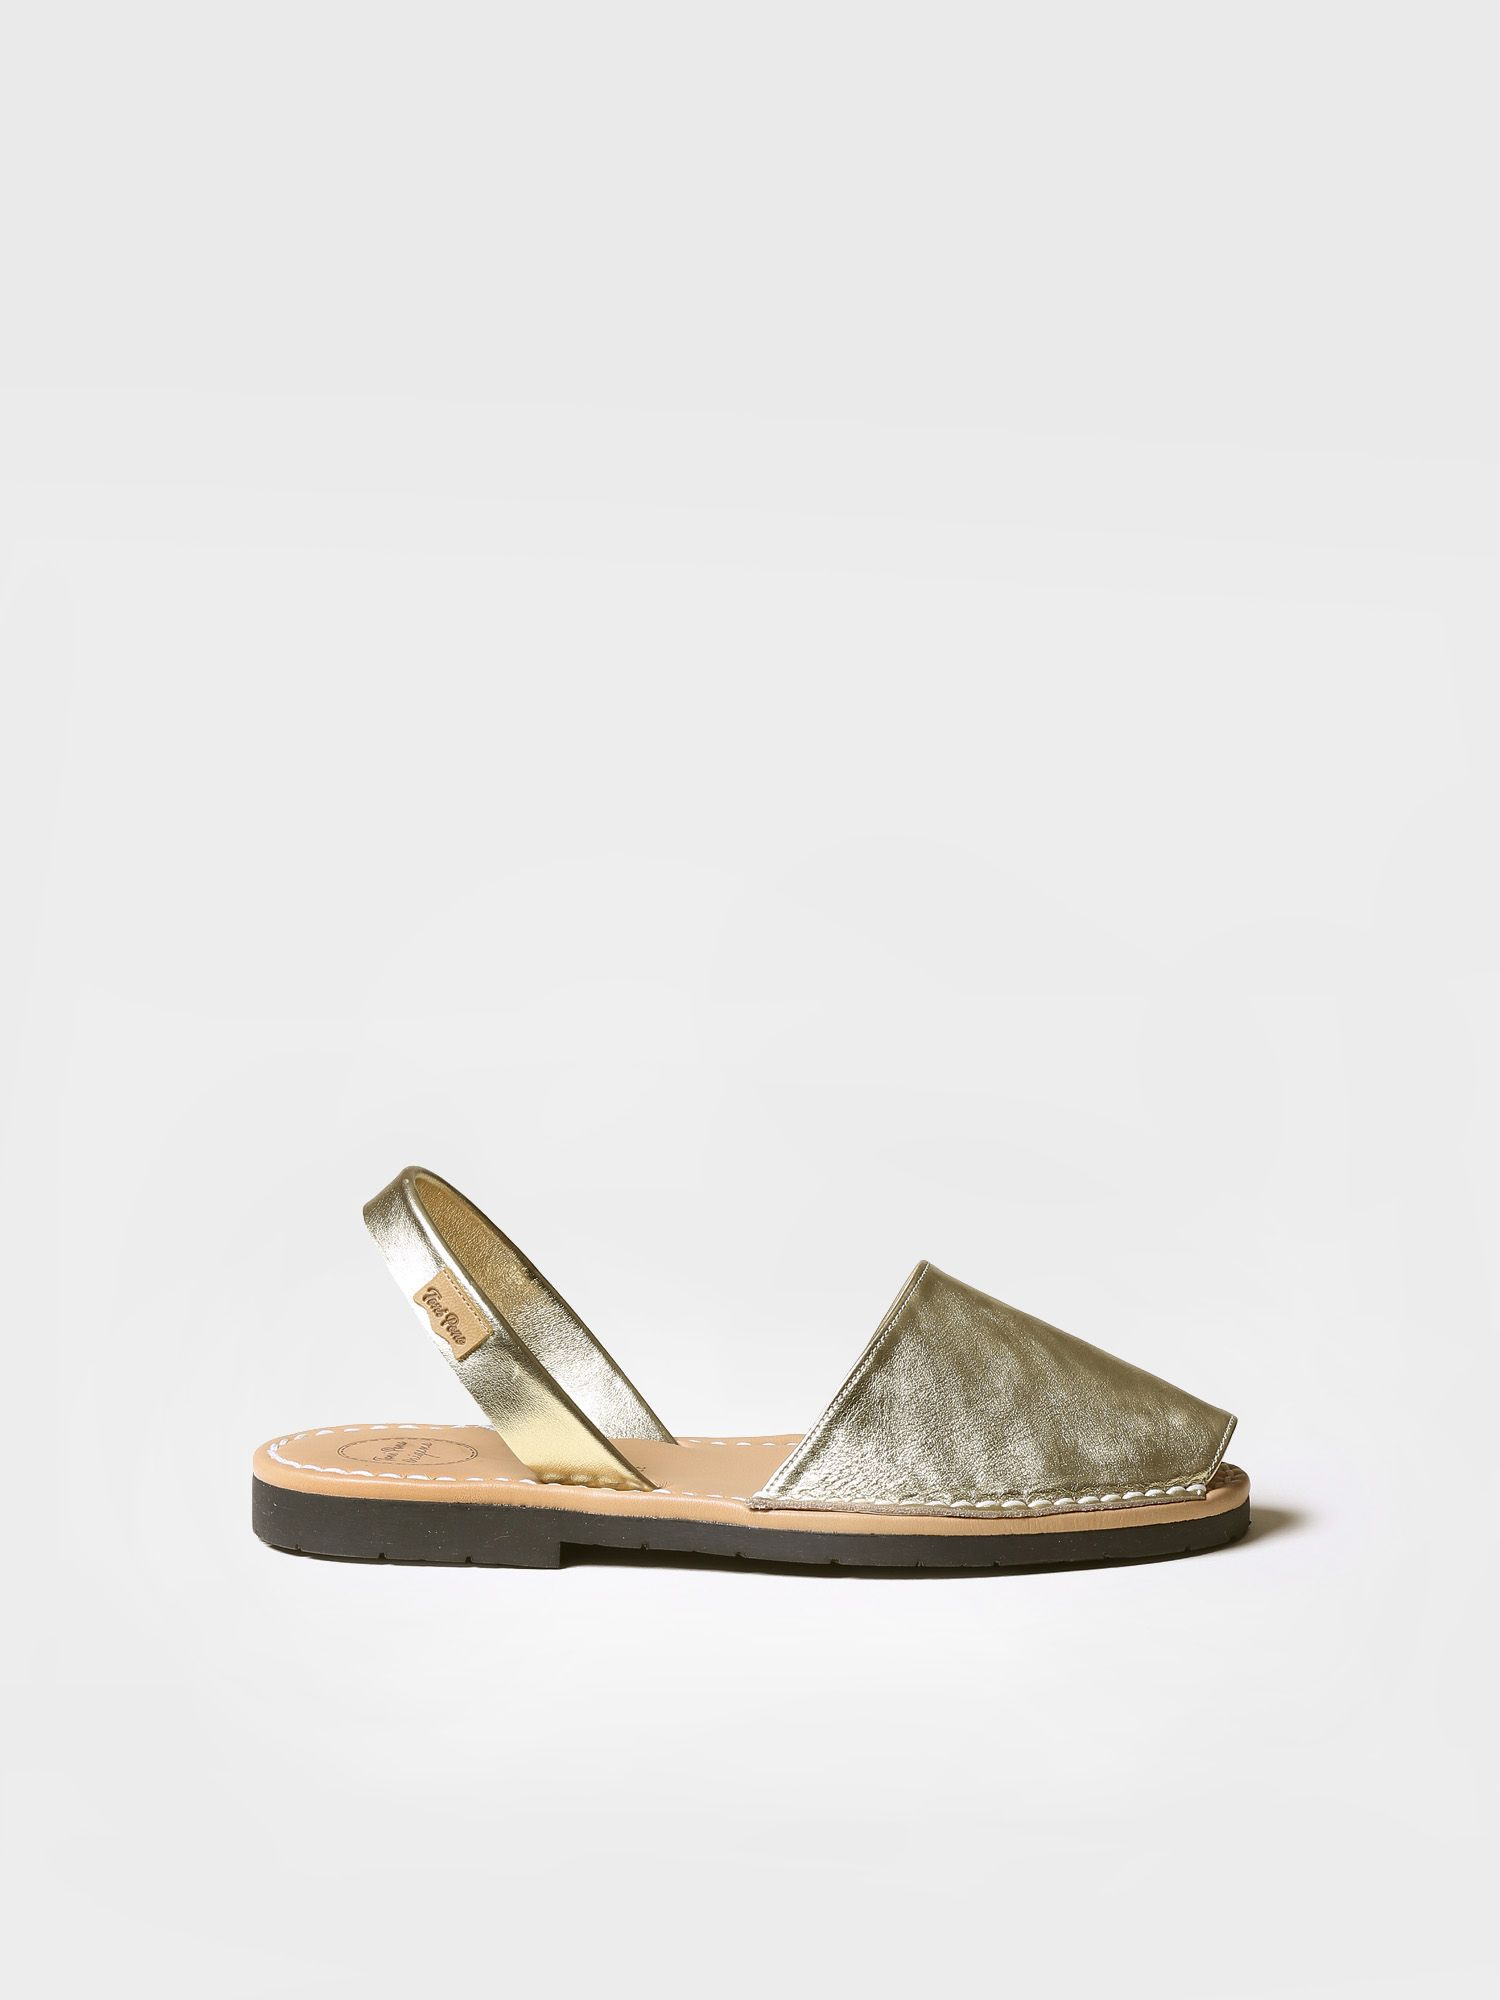 Leather avarca sandal - MAO-P